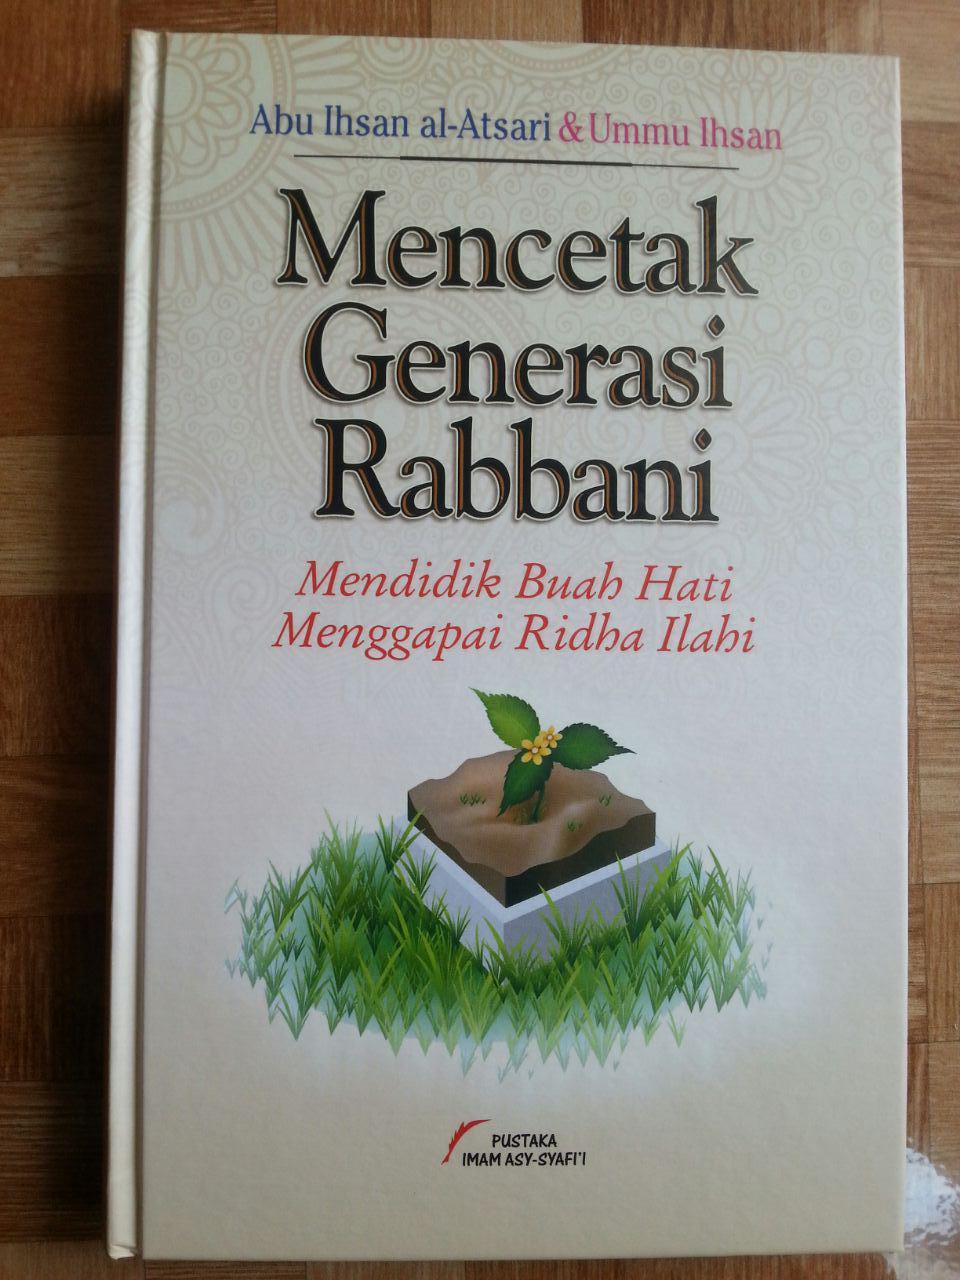 Buku Mencetak Generasi Rabbani cover 2